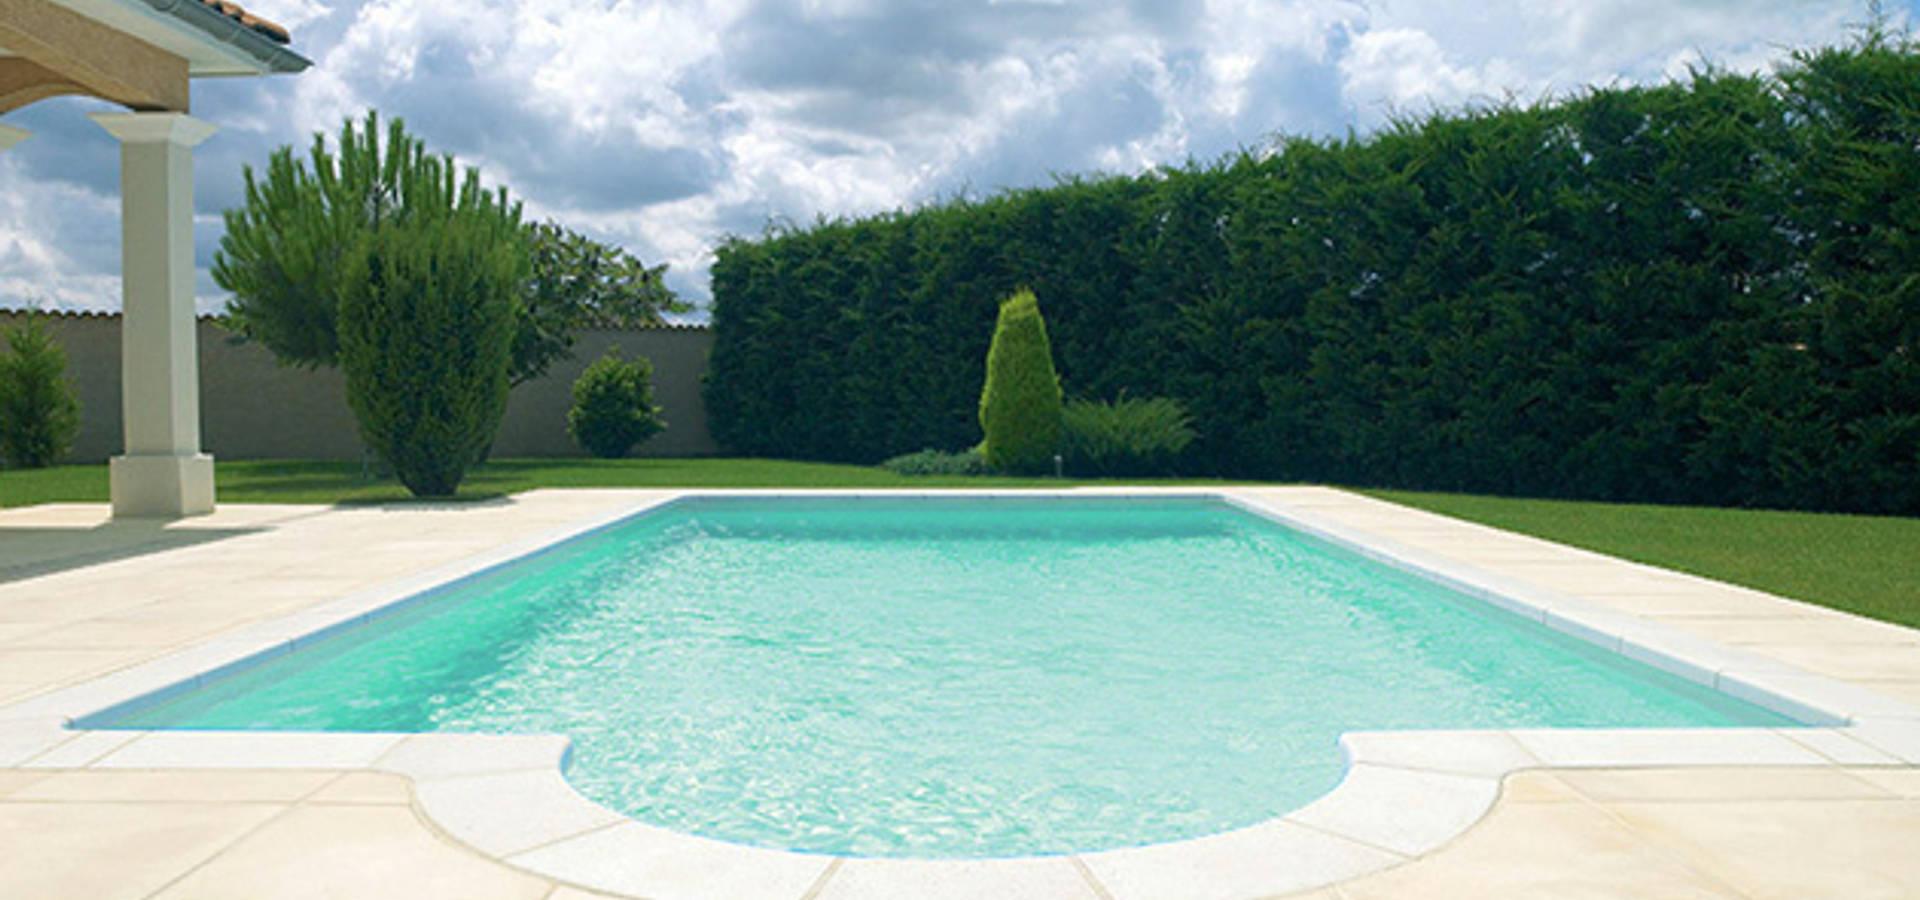 Piscine interrate in pannelli d 39 acciaio di bsvillage - Foto di piscine interrate ...